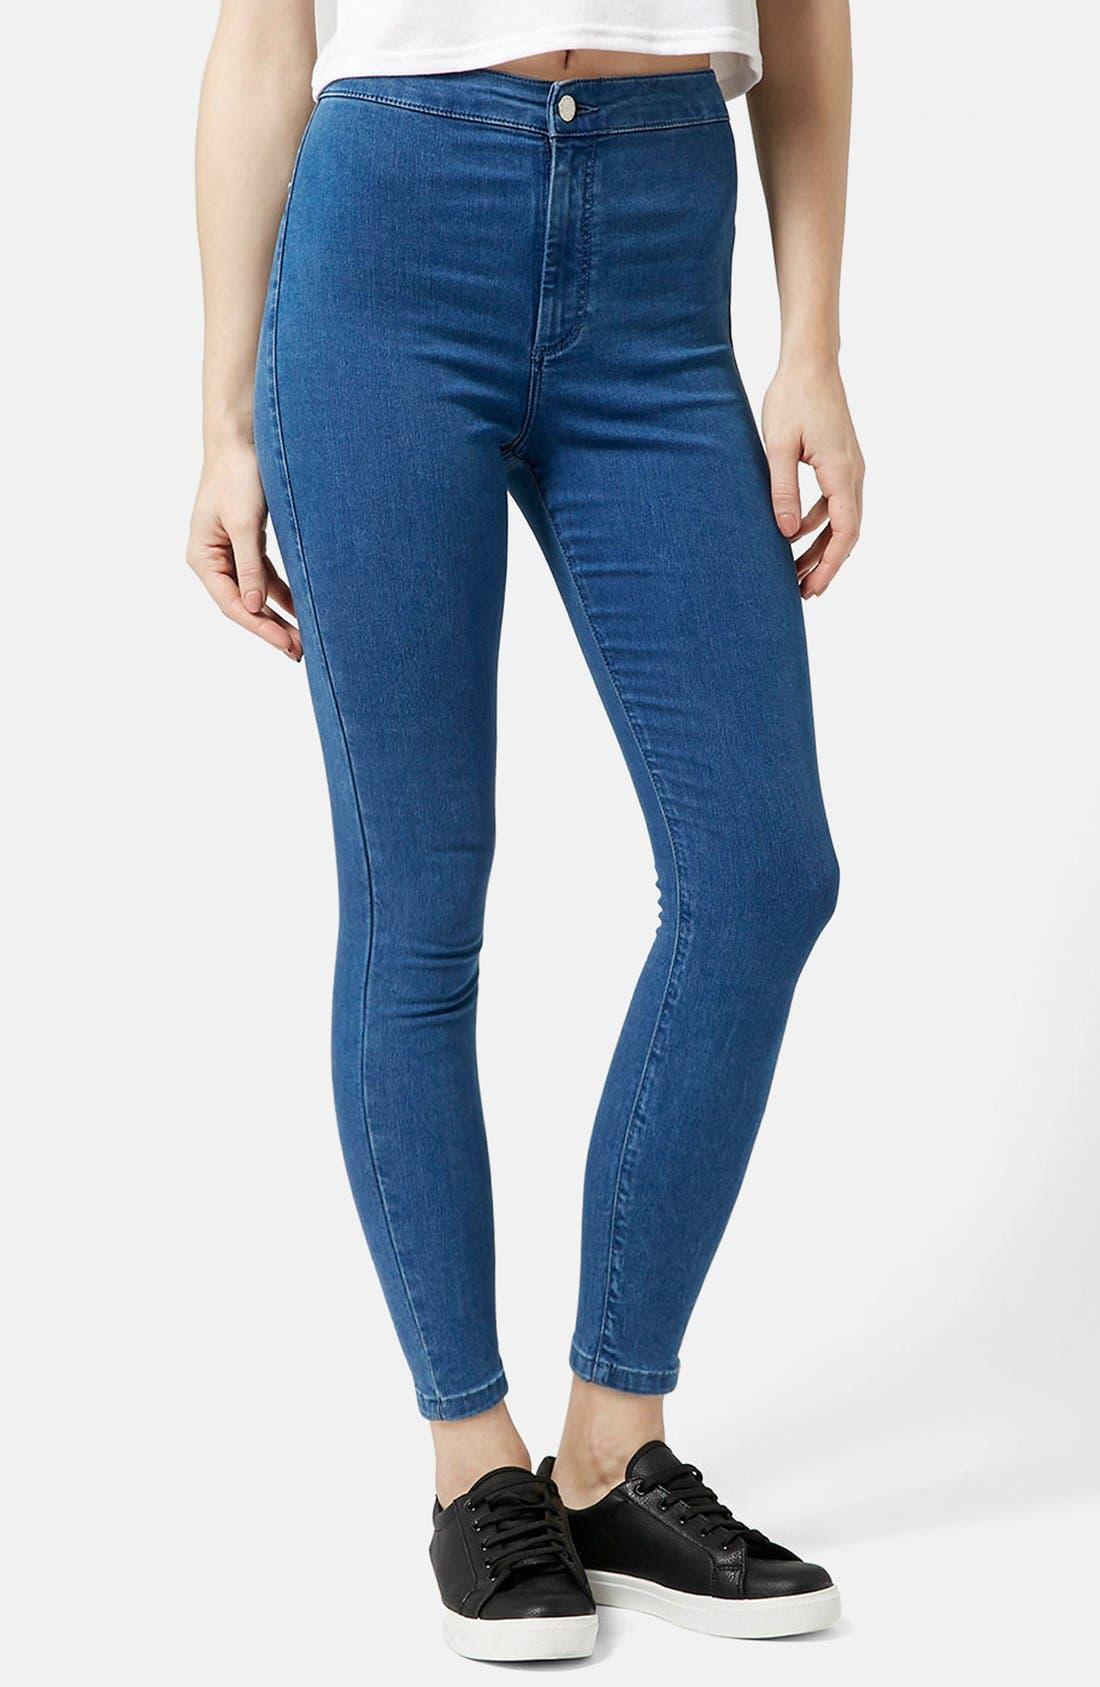 Main Image - Topshop Moto 'Joni' High Rise Super Skinny Jeans (Mid Denim) (Petite)